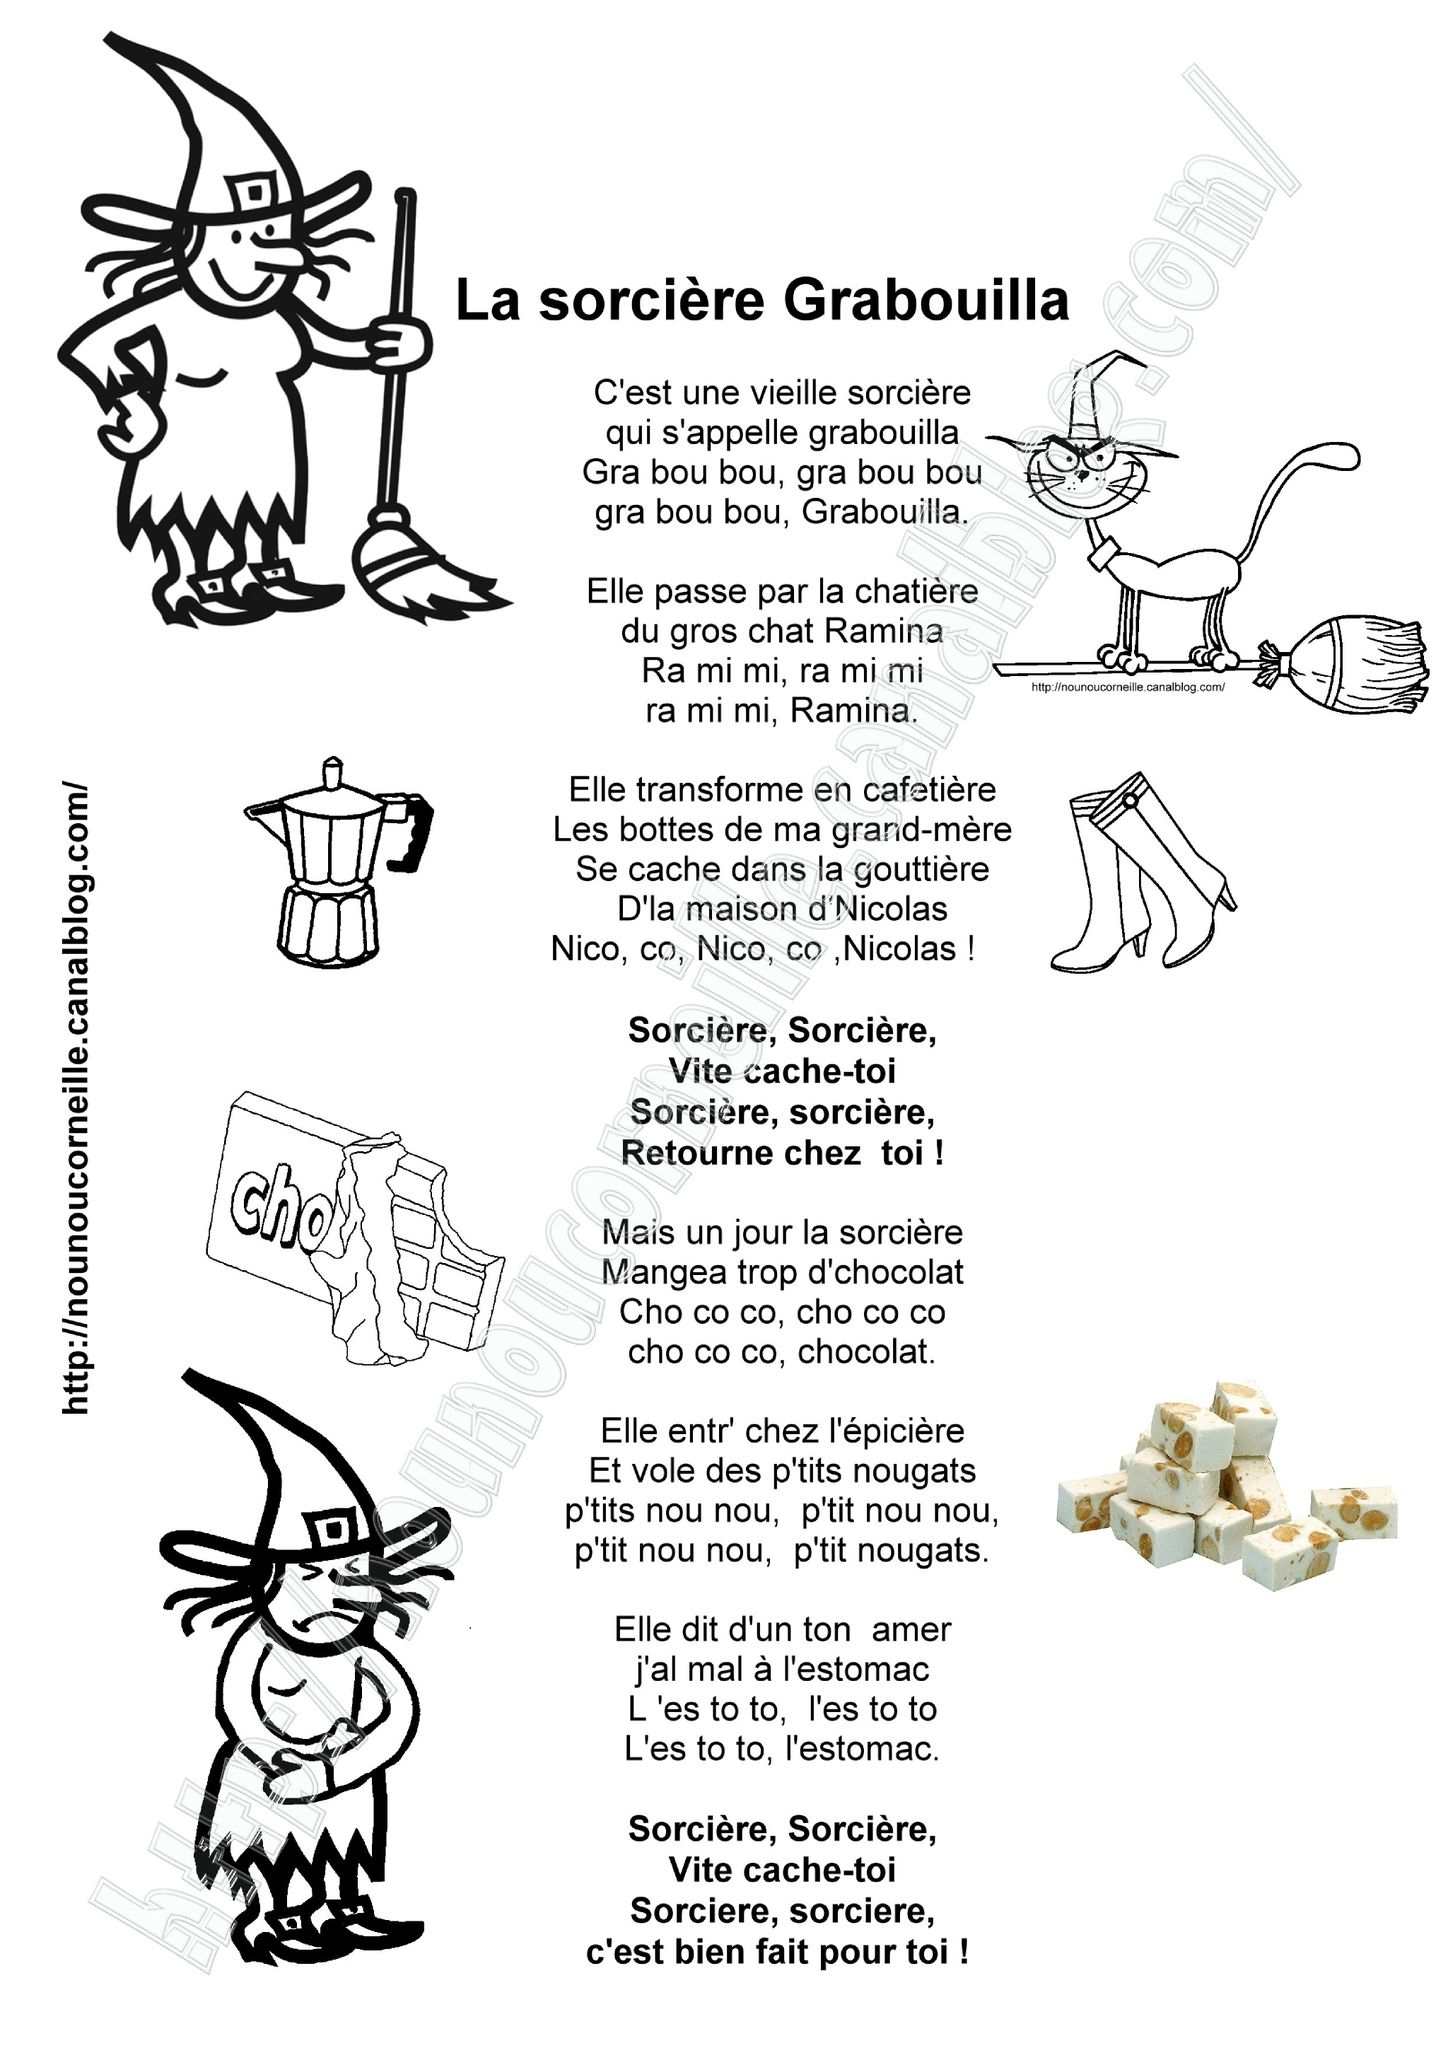 L As Tu Vu Paroles - Greatestcoloringbook concernant L As Tu Vu Paroles